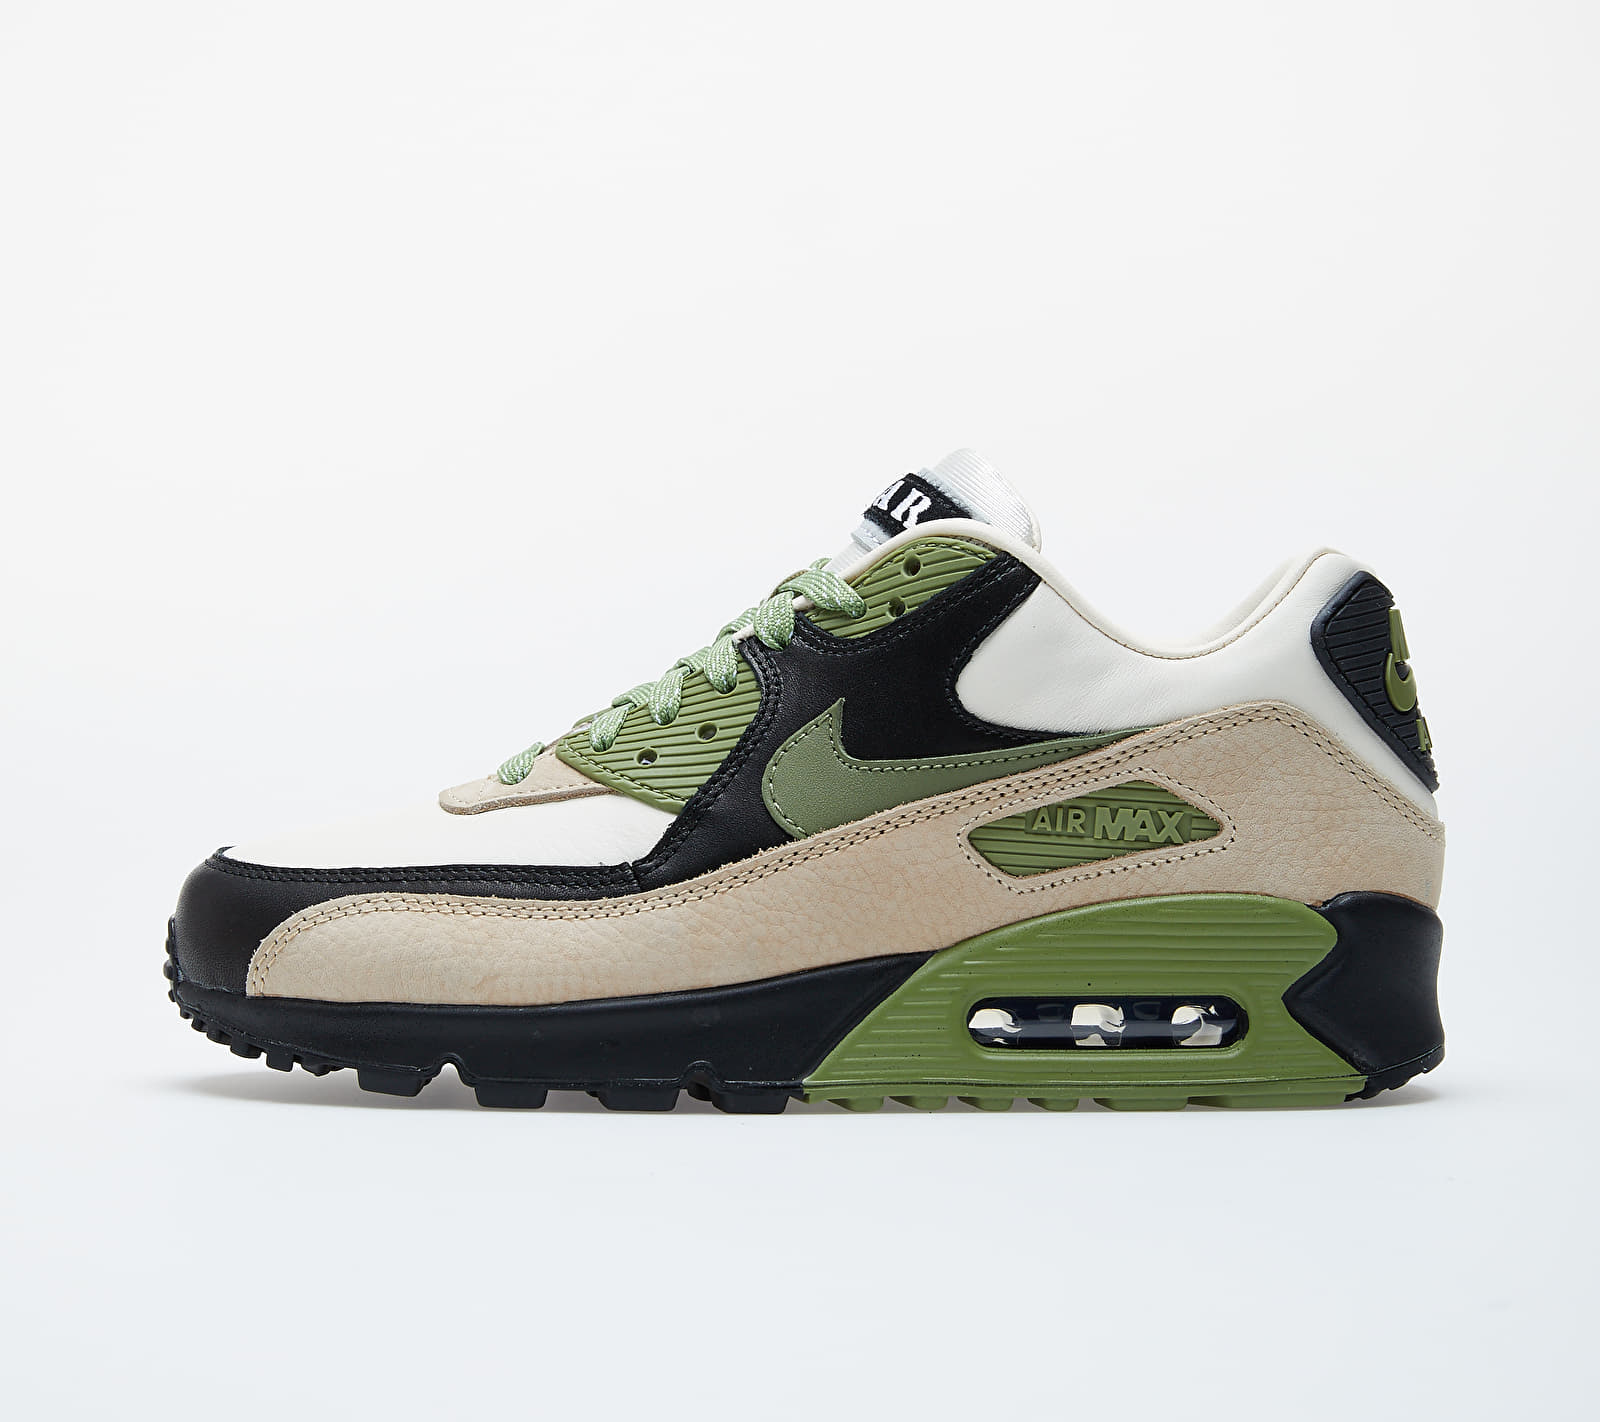 Nike Air Max 90 NRG Light Cream/ Alligator-Pale Ivory-Black CI5646-200